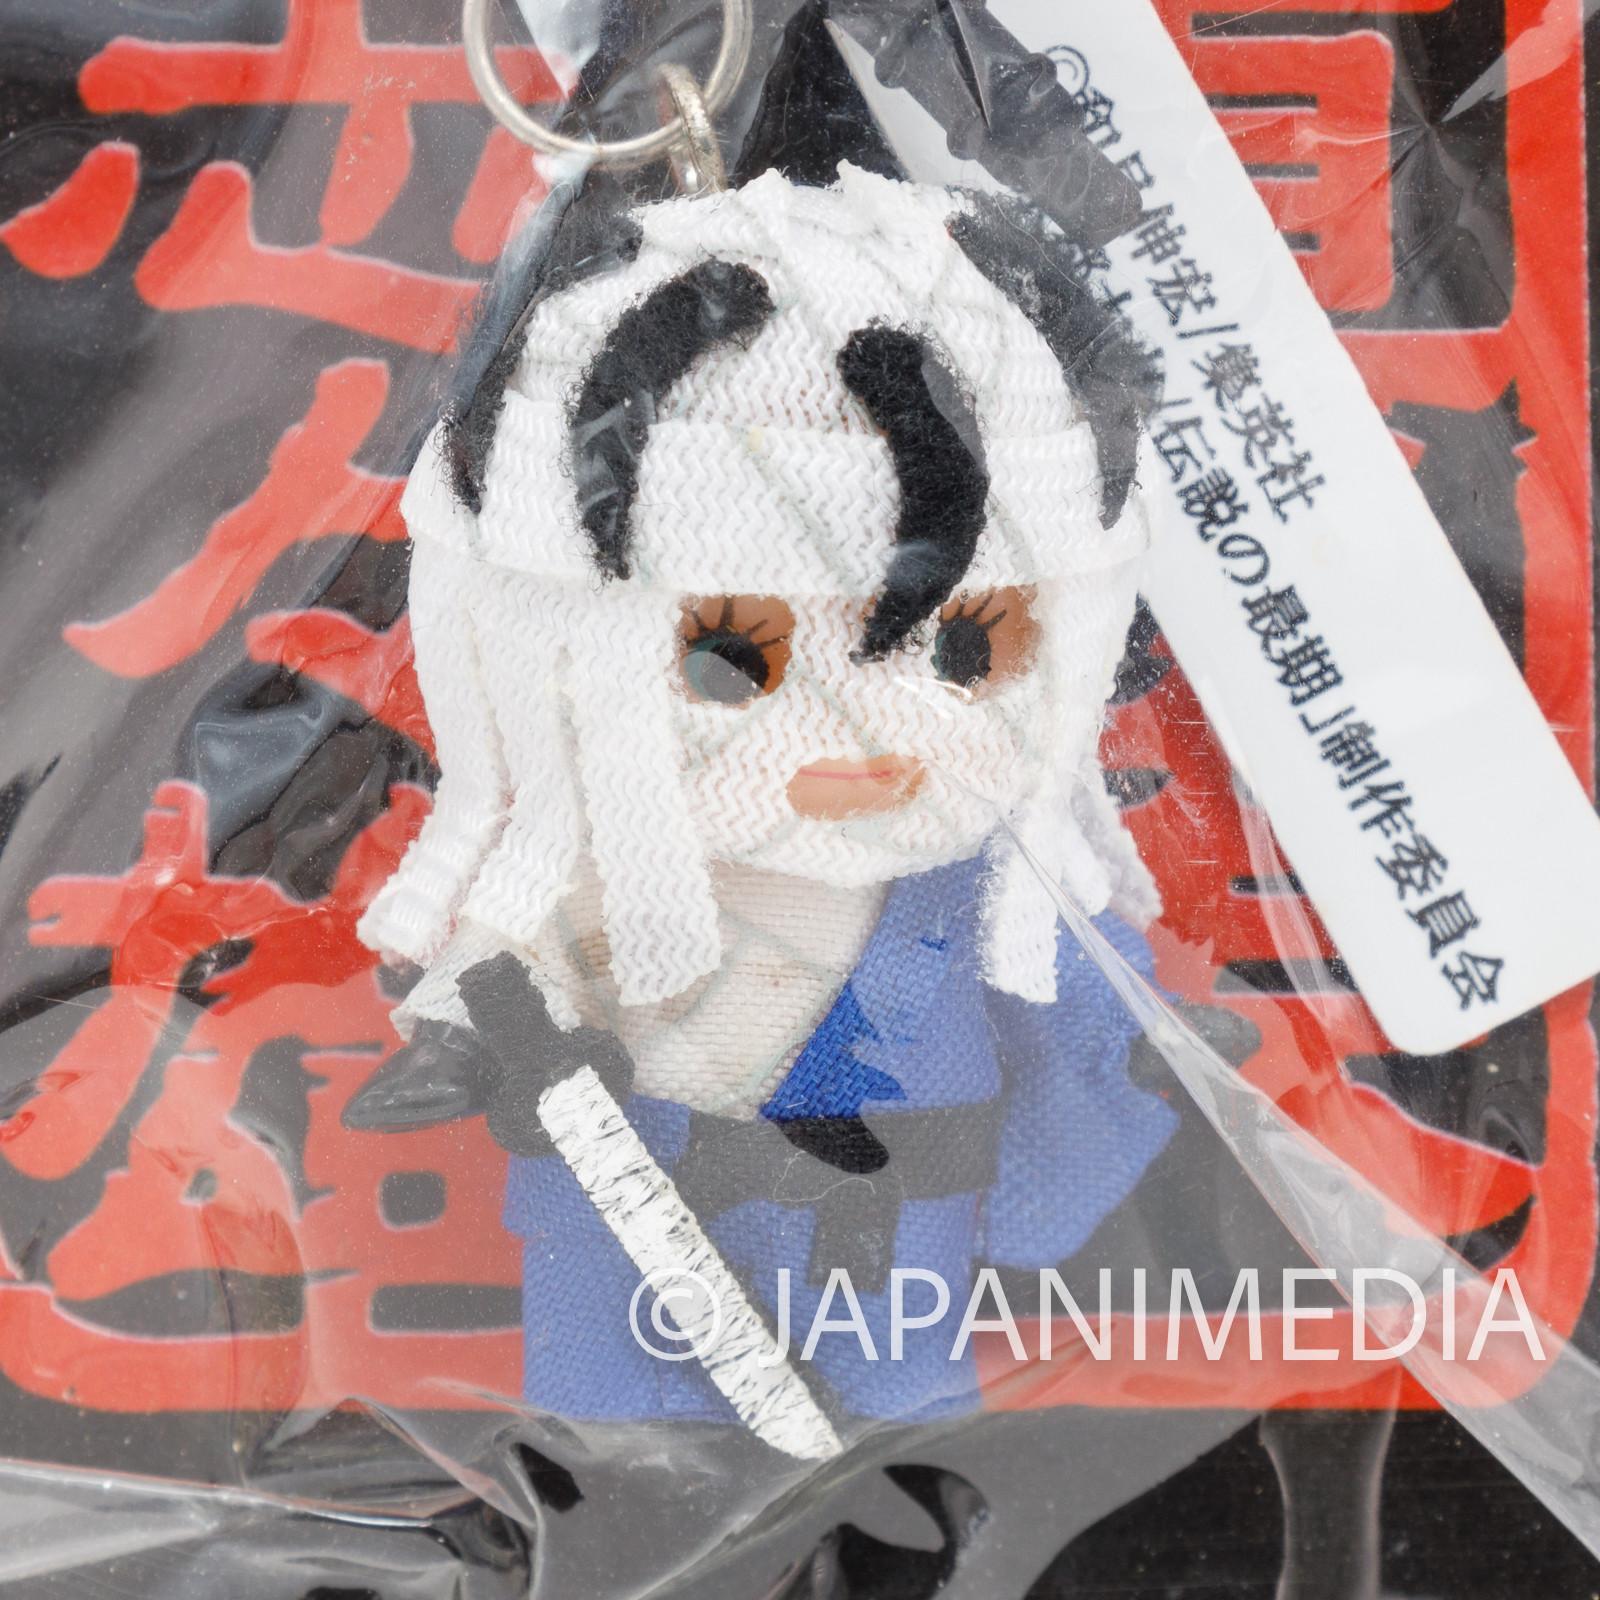 Rurouni Kenshin Shishio Makoto x Kewpie Figure Earphone Jack JAPAN ANIME